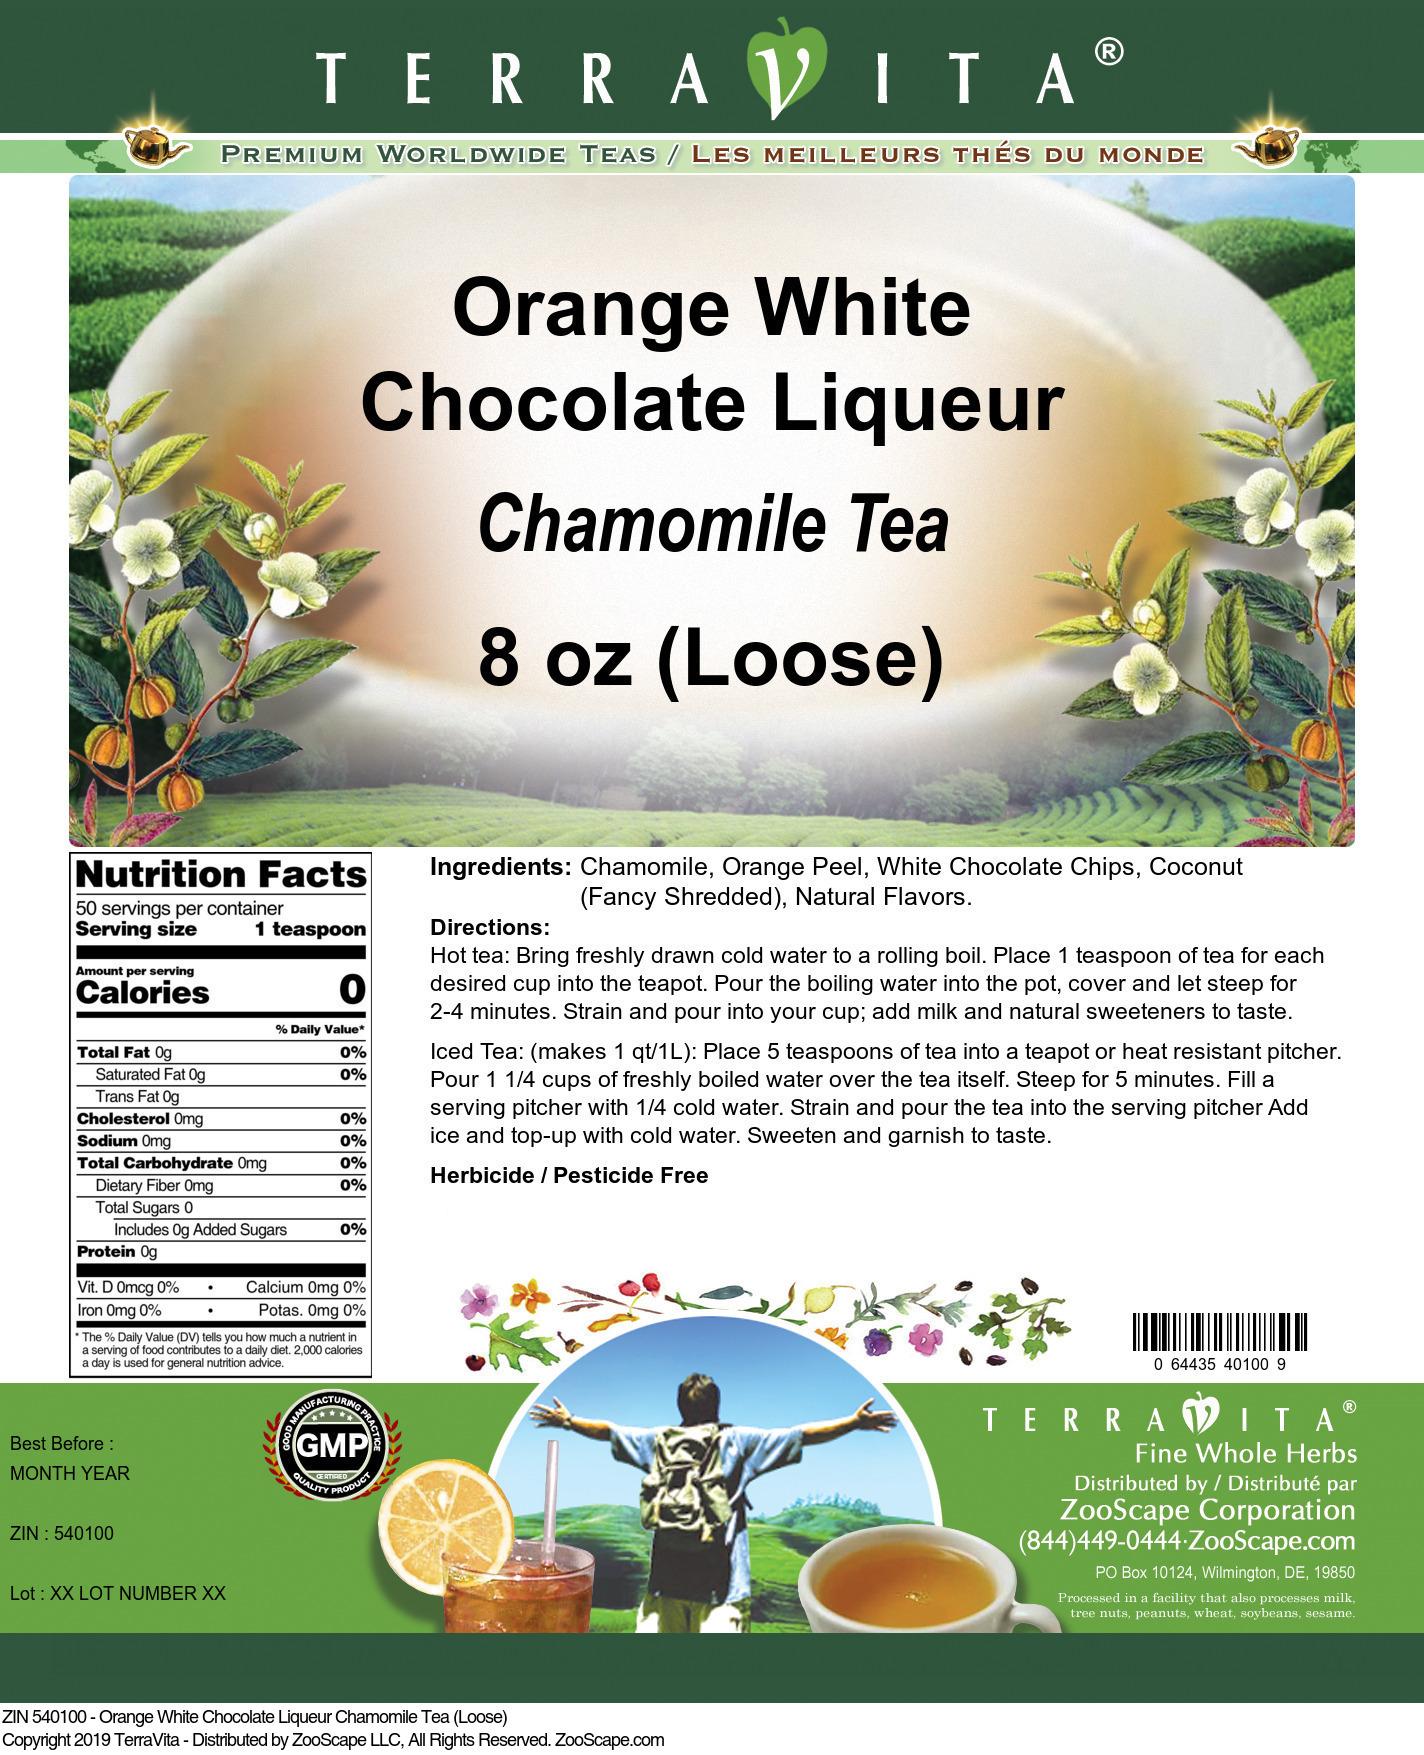 Orange White Chocolate Liqueur Chamomile Tea